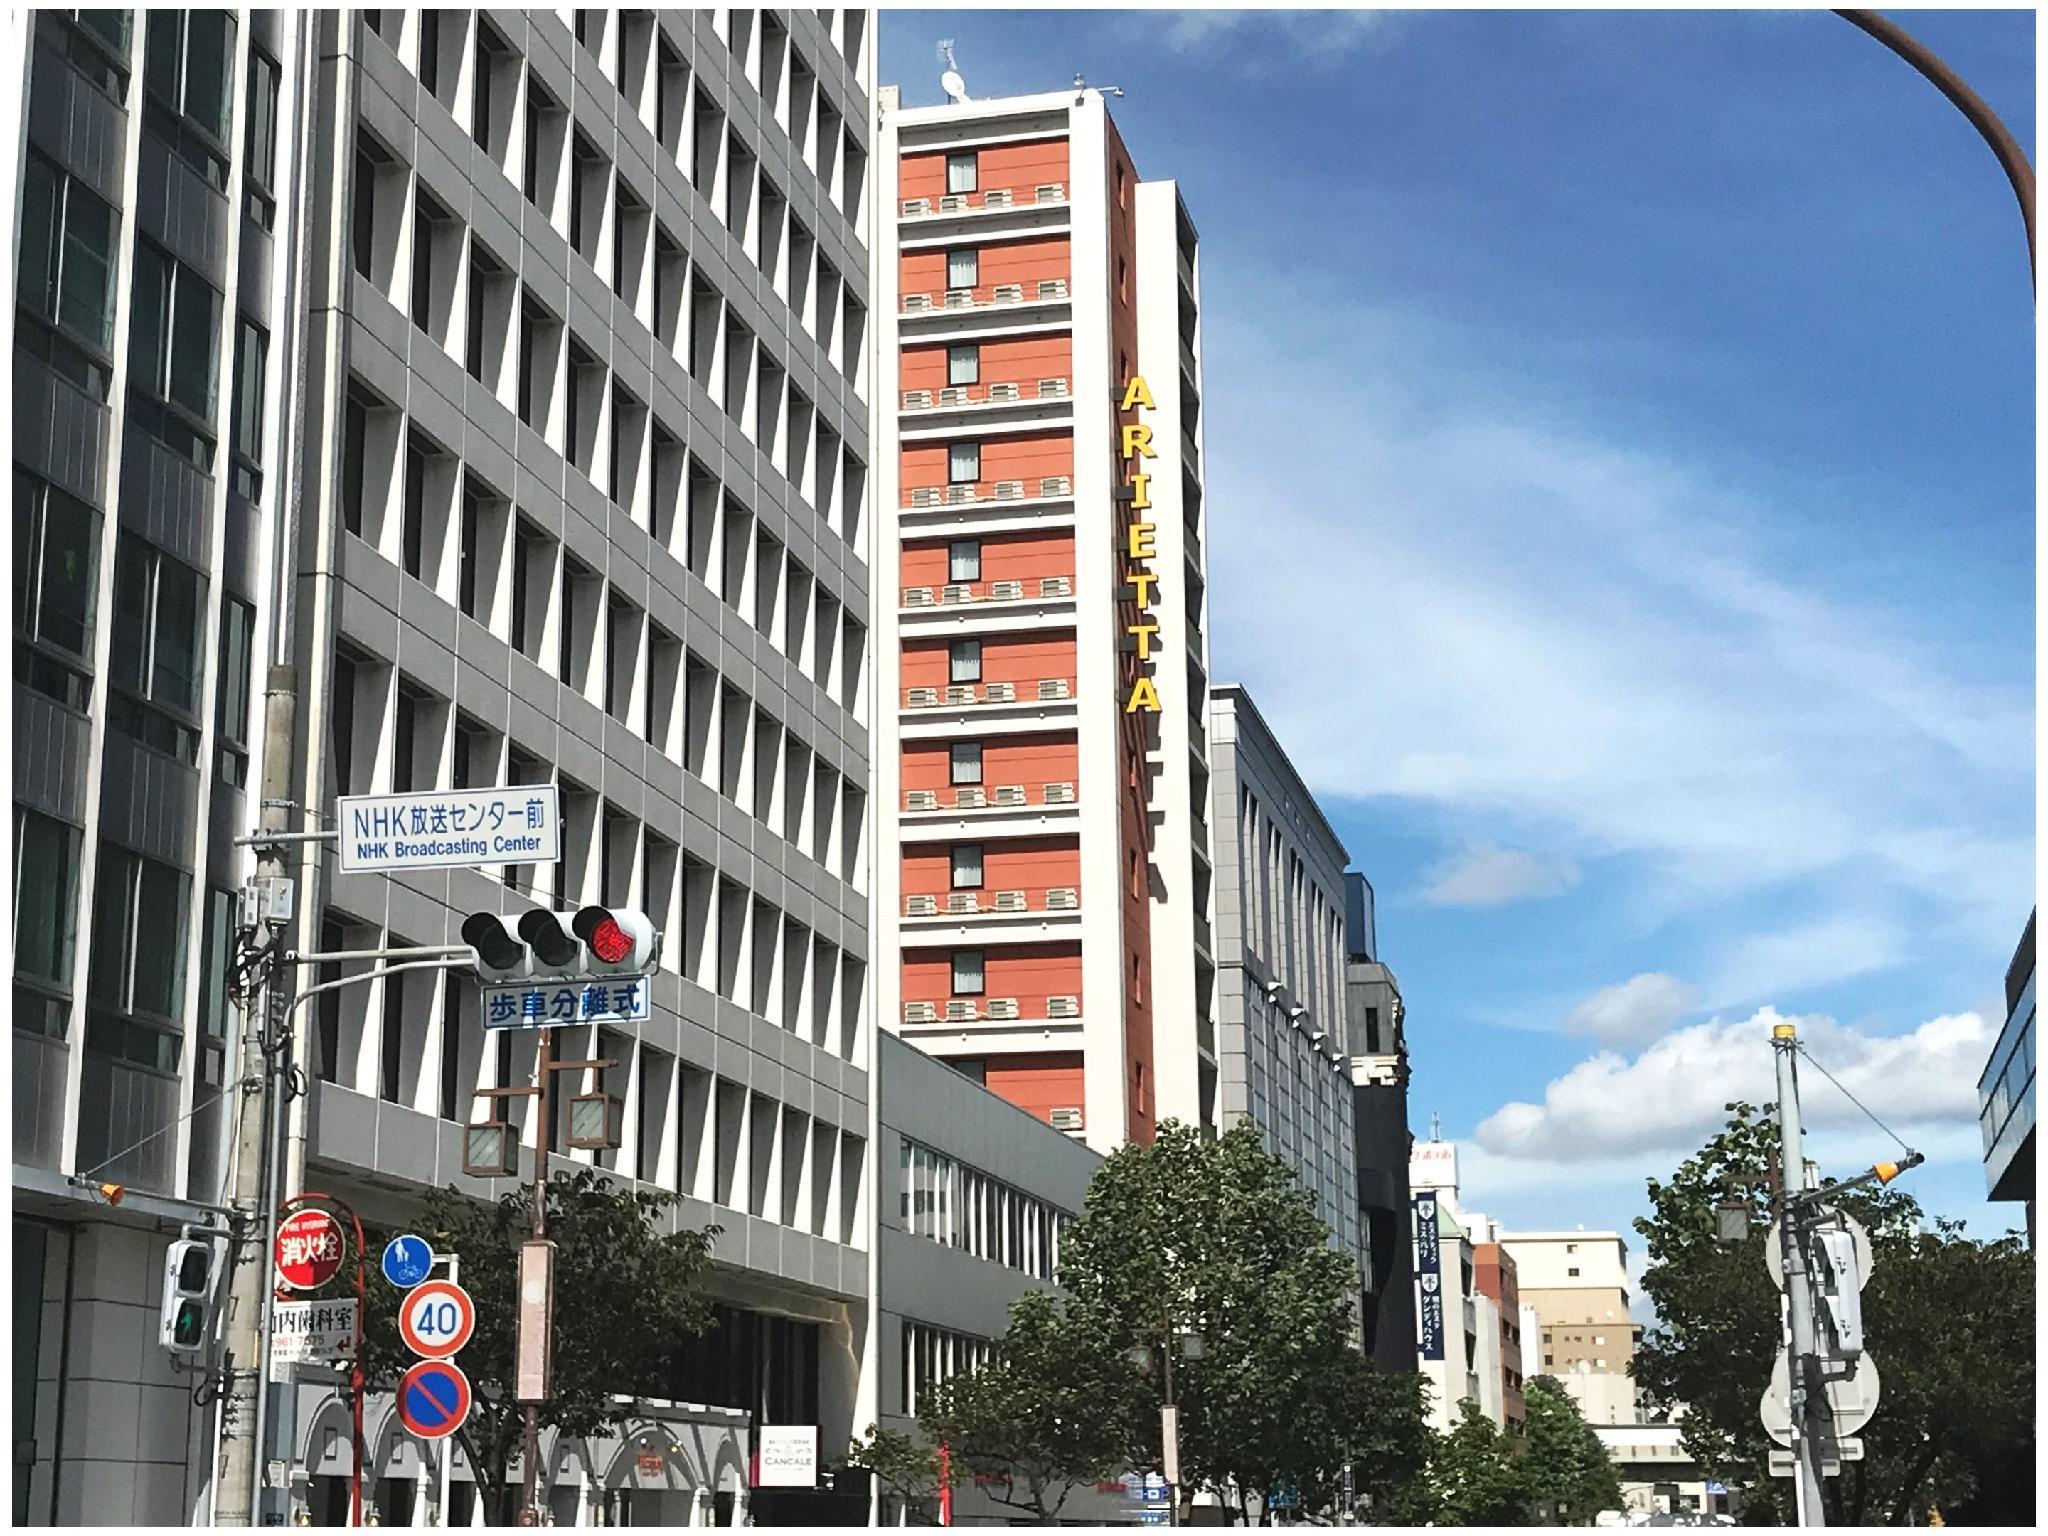 Arietta Hotel Nagoya